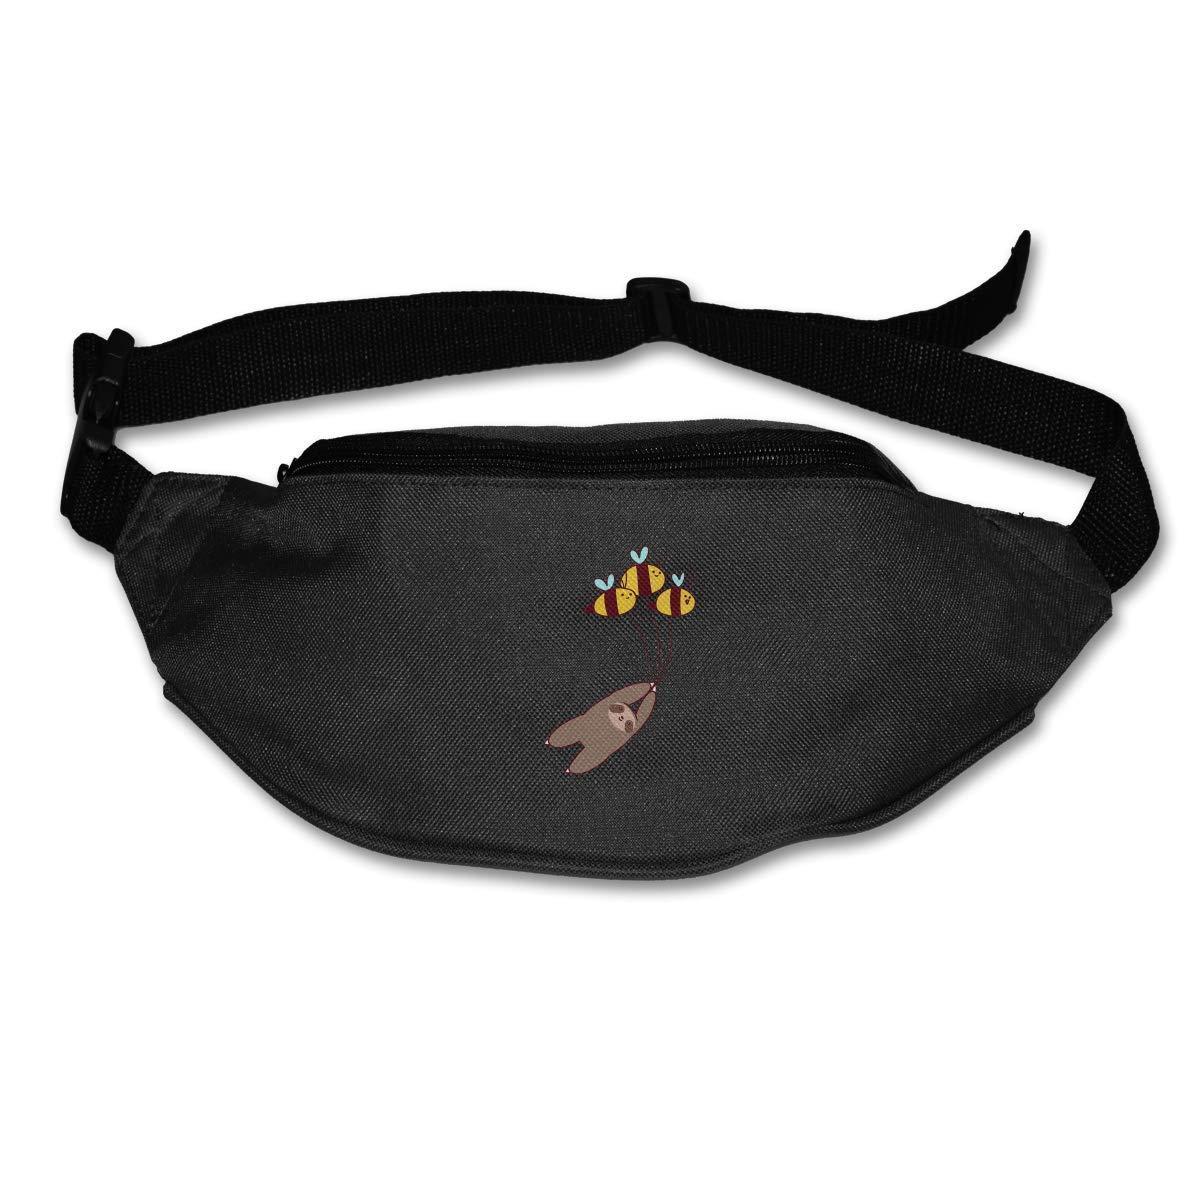 xjh558798 Sloth and Bumble Bees Running orts Waist Bag Zipper Pockets Water